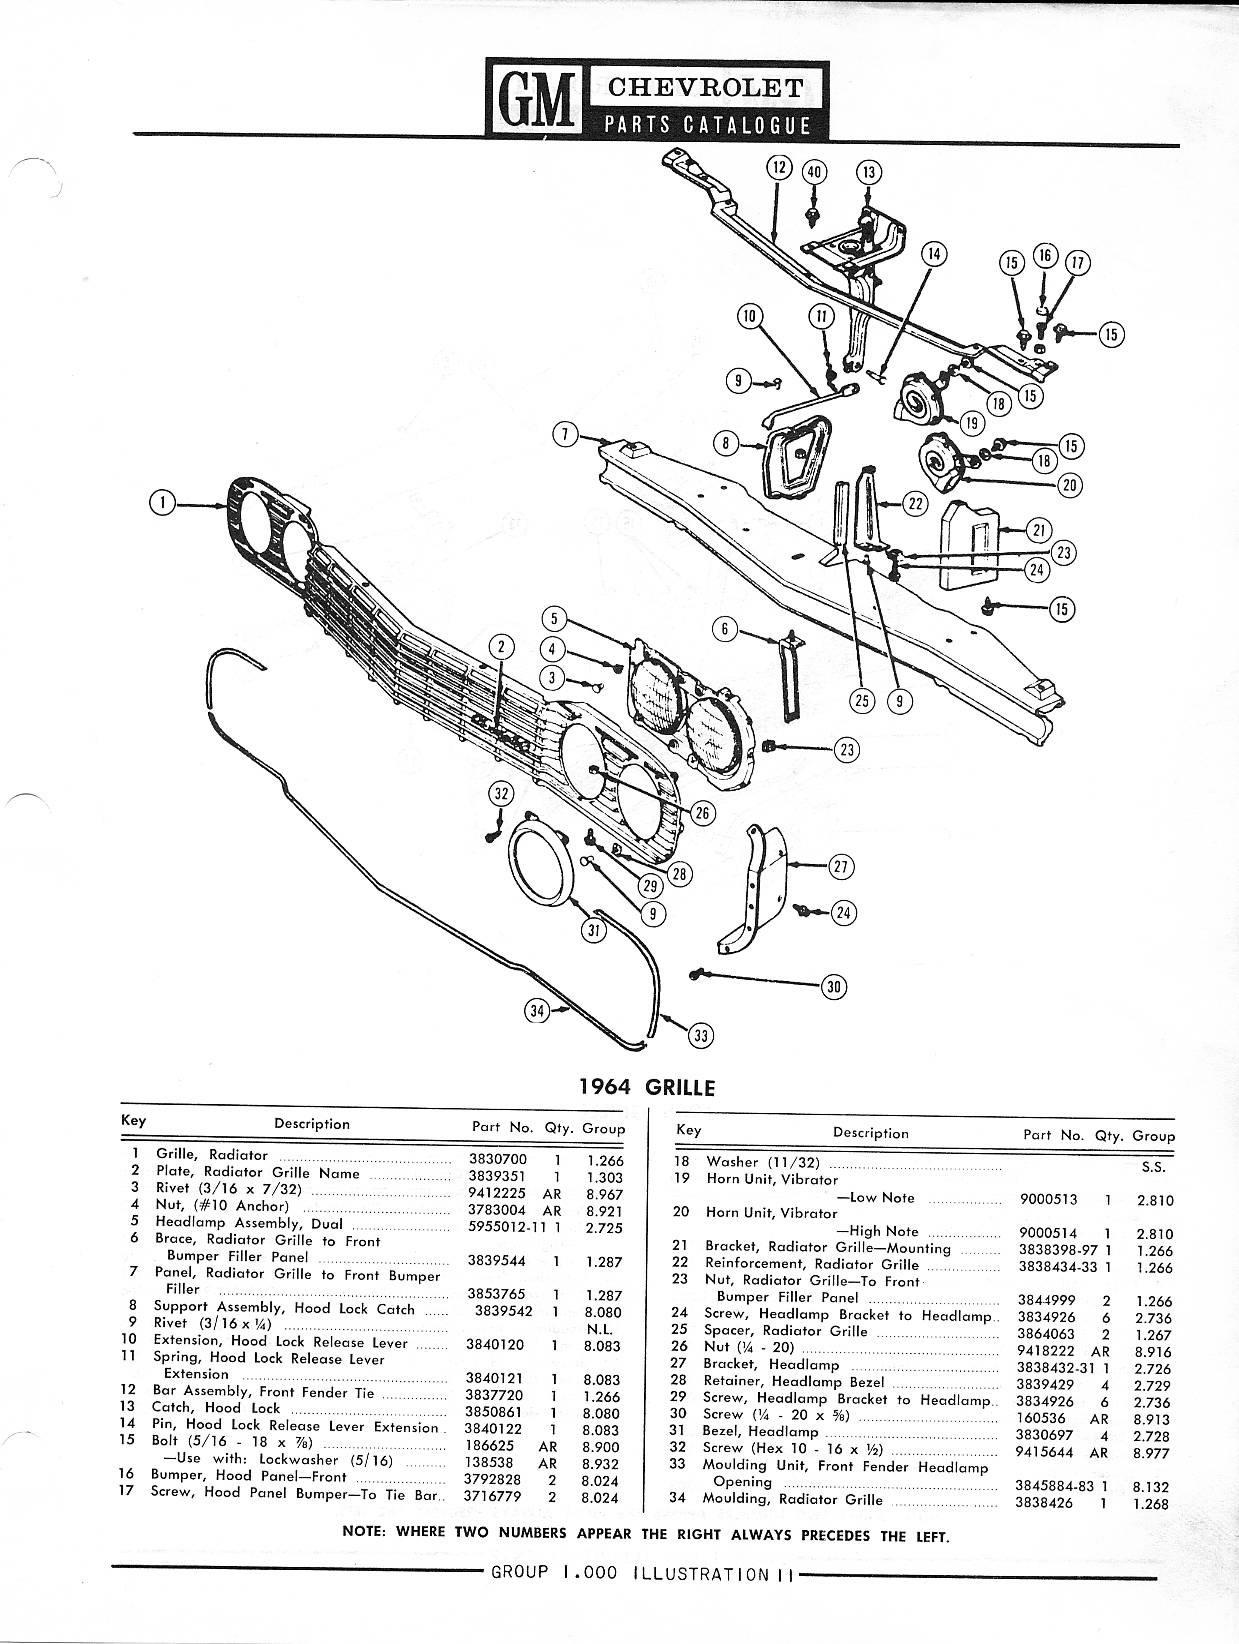 1958-1968 Chevrolet Parts Catalog / Image147.jpg